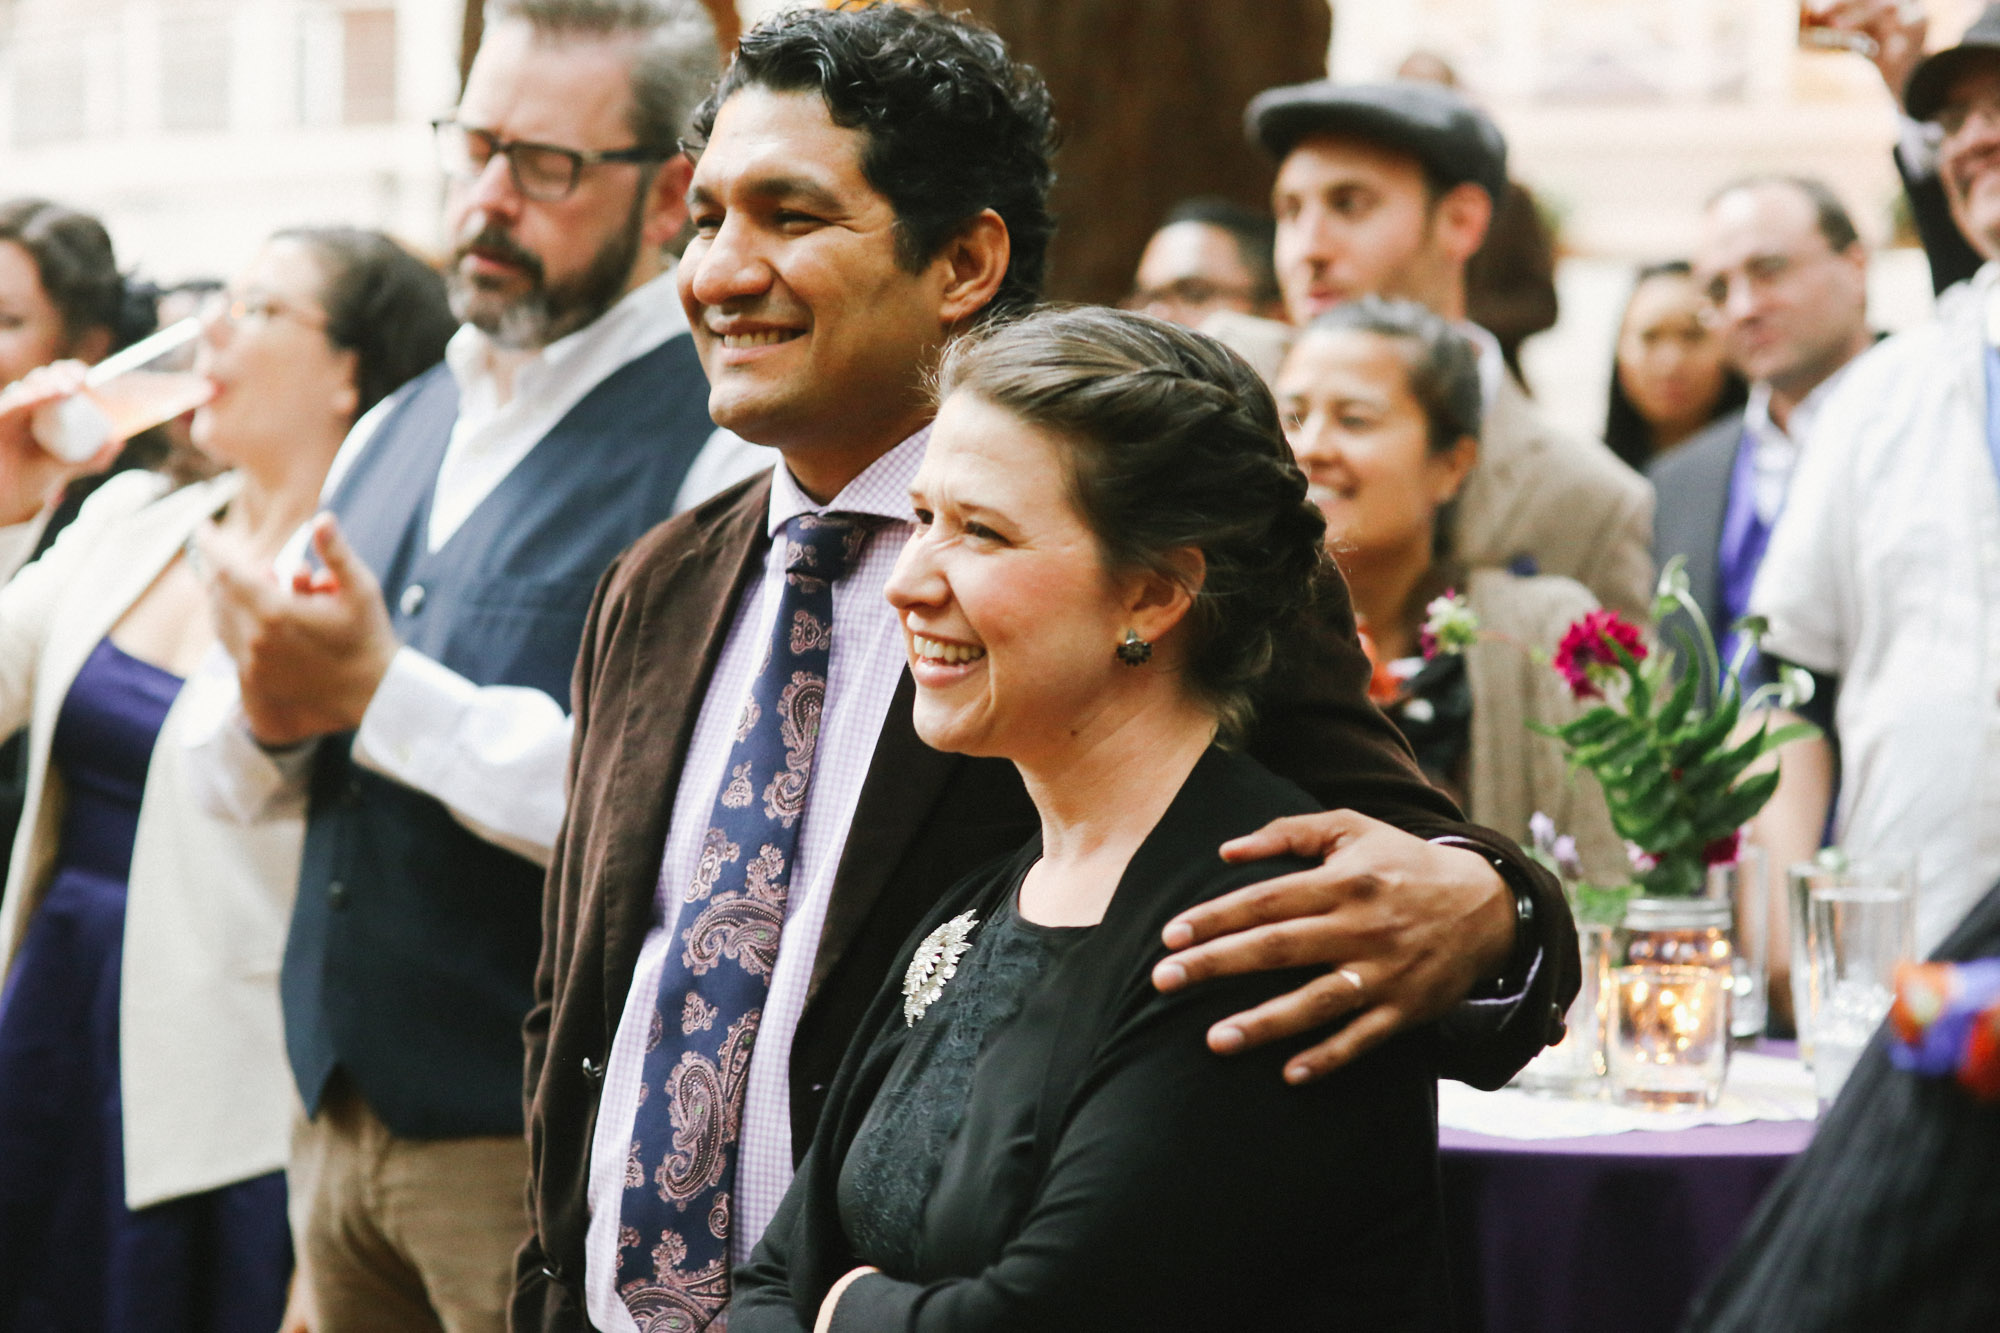 Wedding_Trocadero_house_Stern Grove_offbeat_San_Francisco-53.jpg